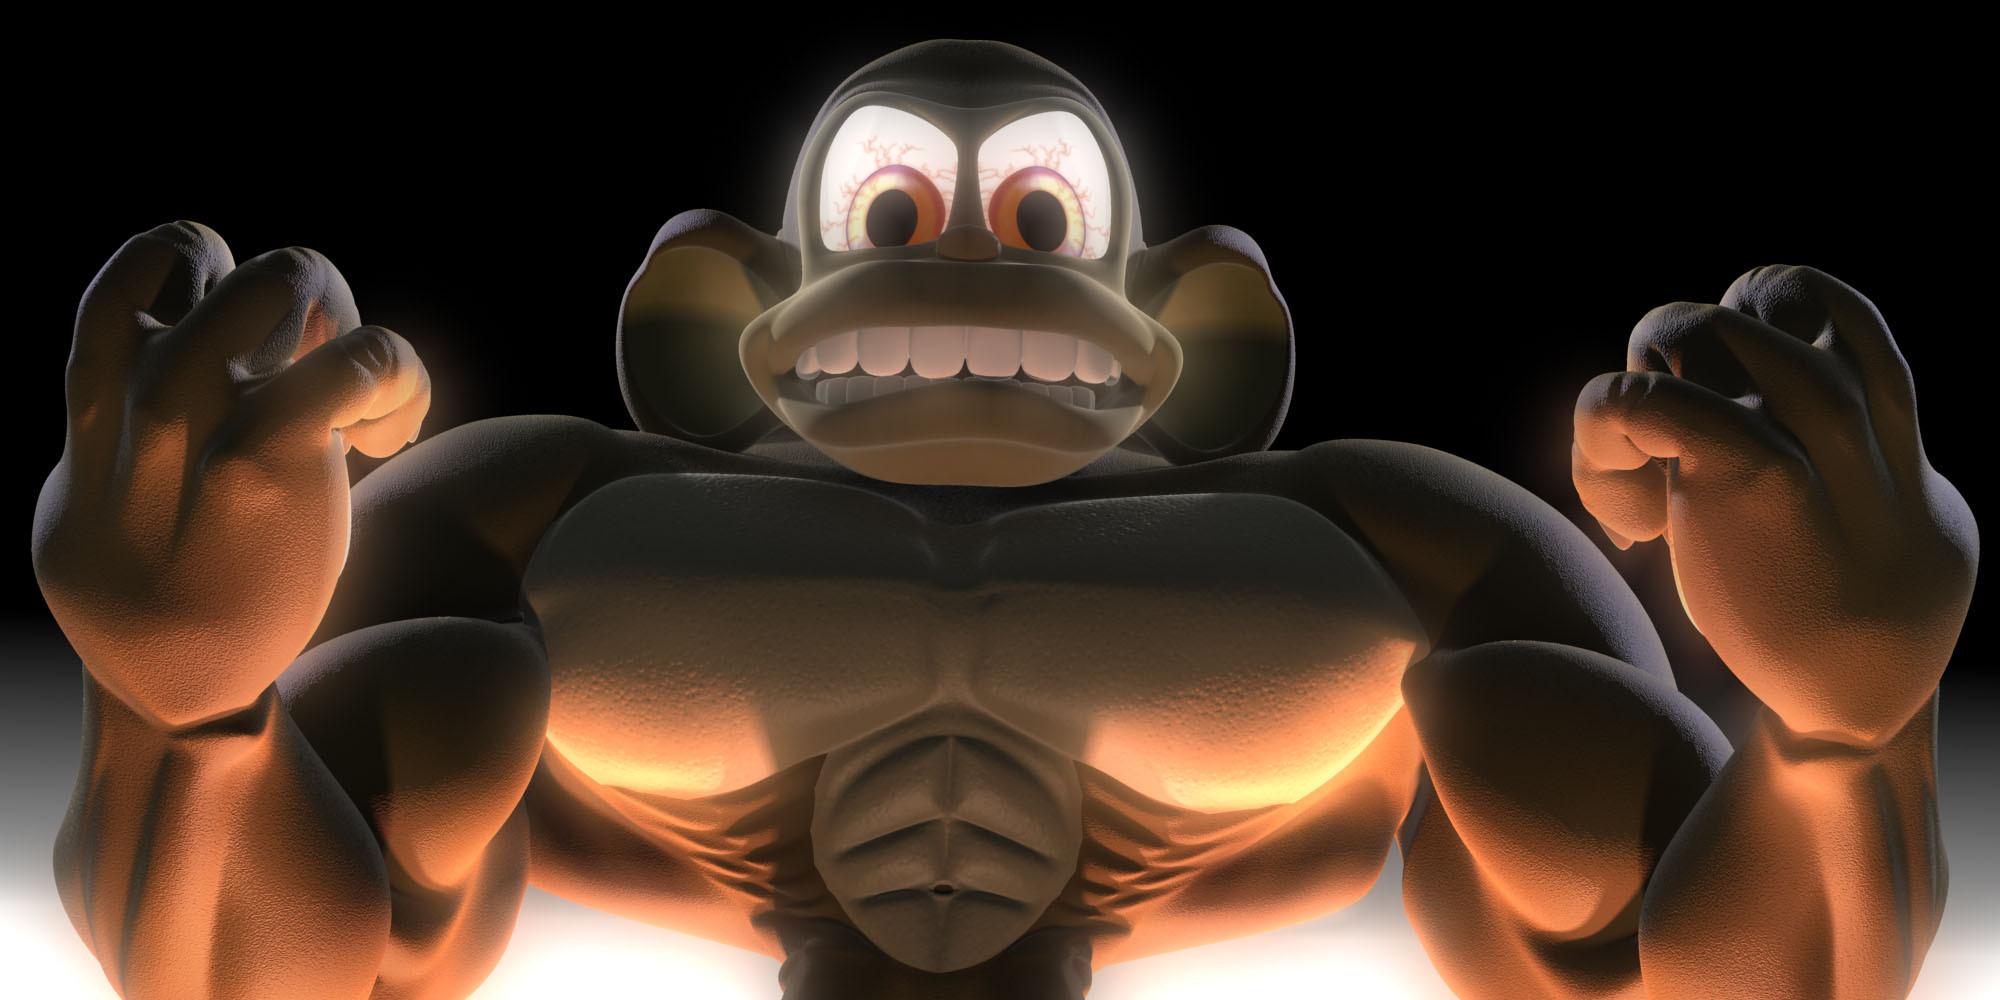 Herc Monkey needs roids